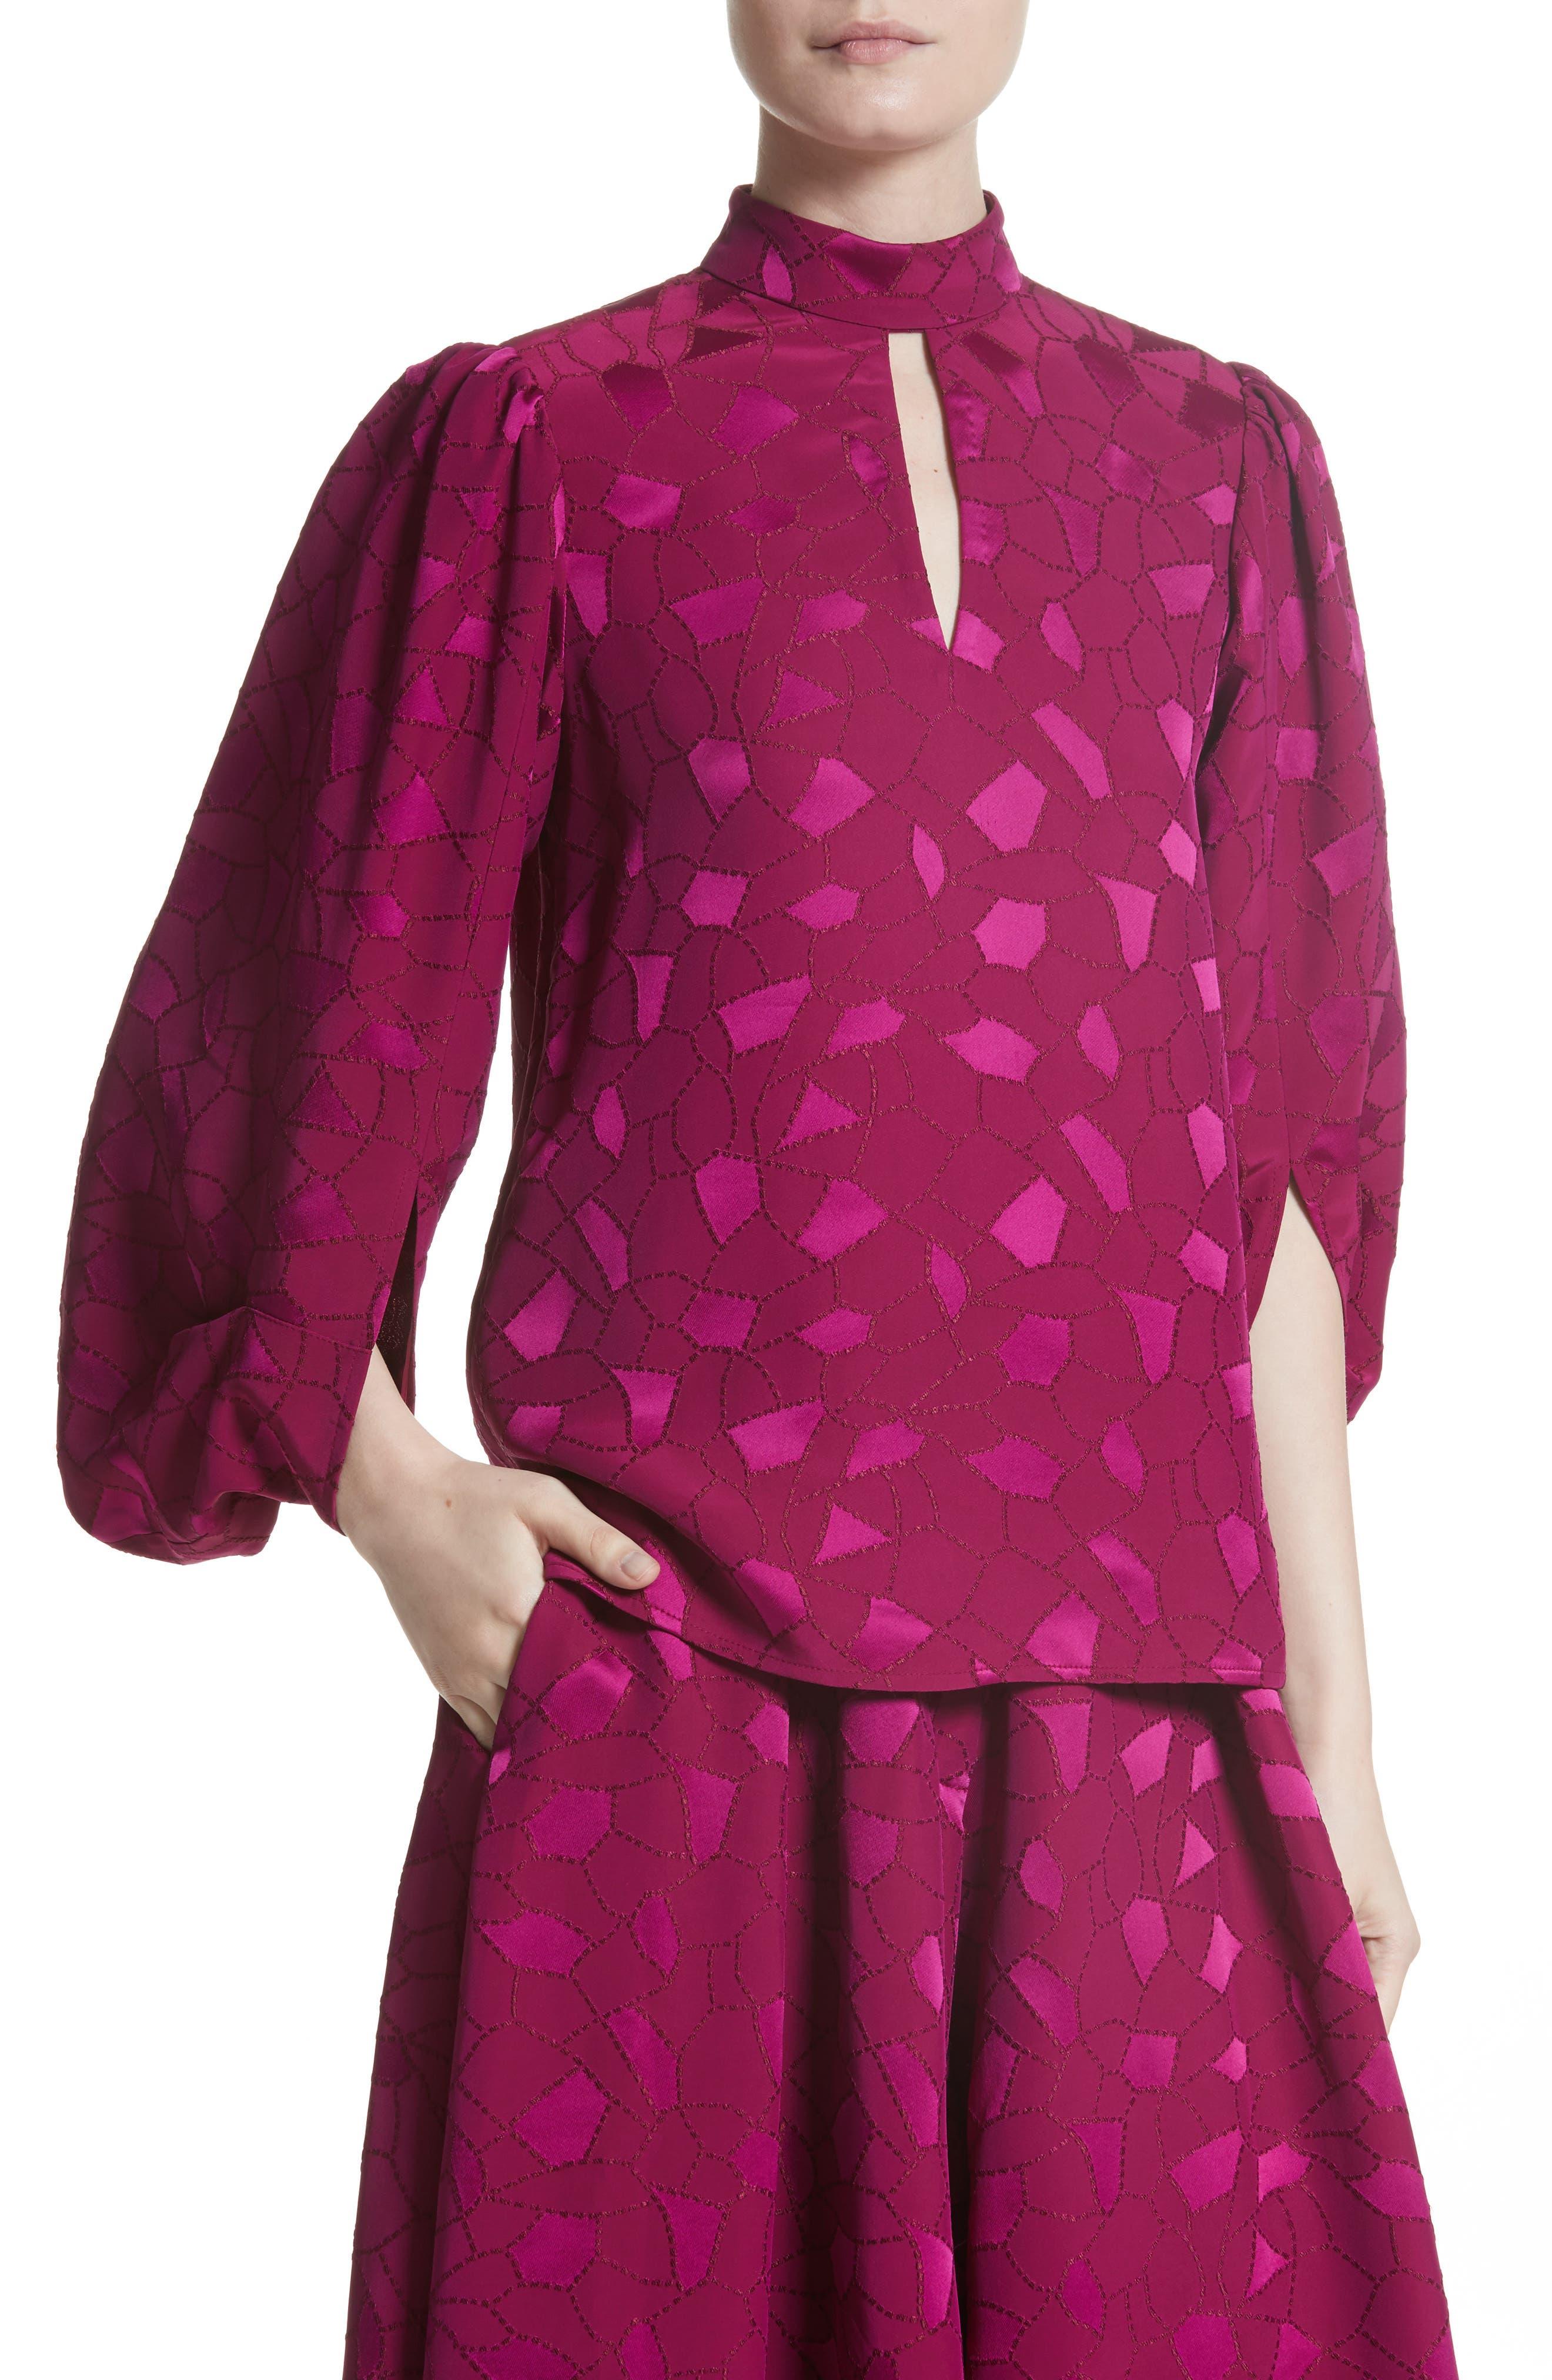 Mosaic Jacquard Puff Sleeve Blouse,                             Alternate thumbnail 4, color,                             Pink